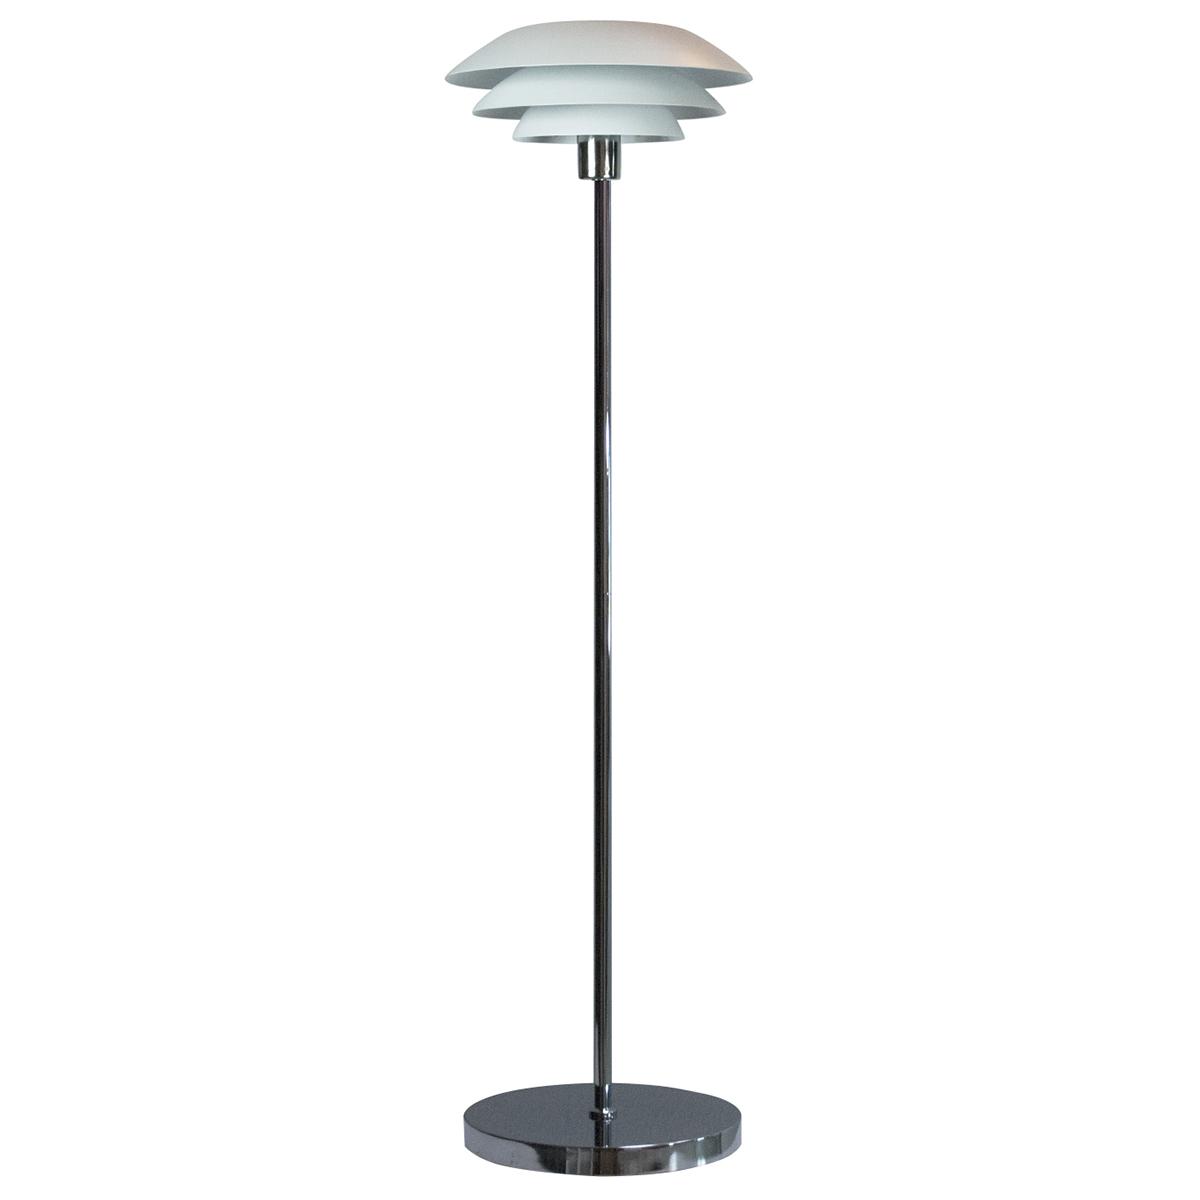 DybergLarsen gulvlampe - DL31 - Mathvid